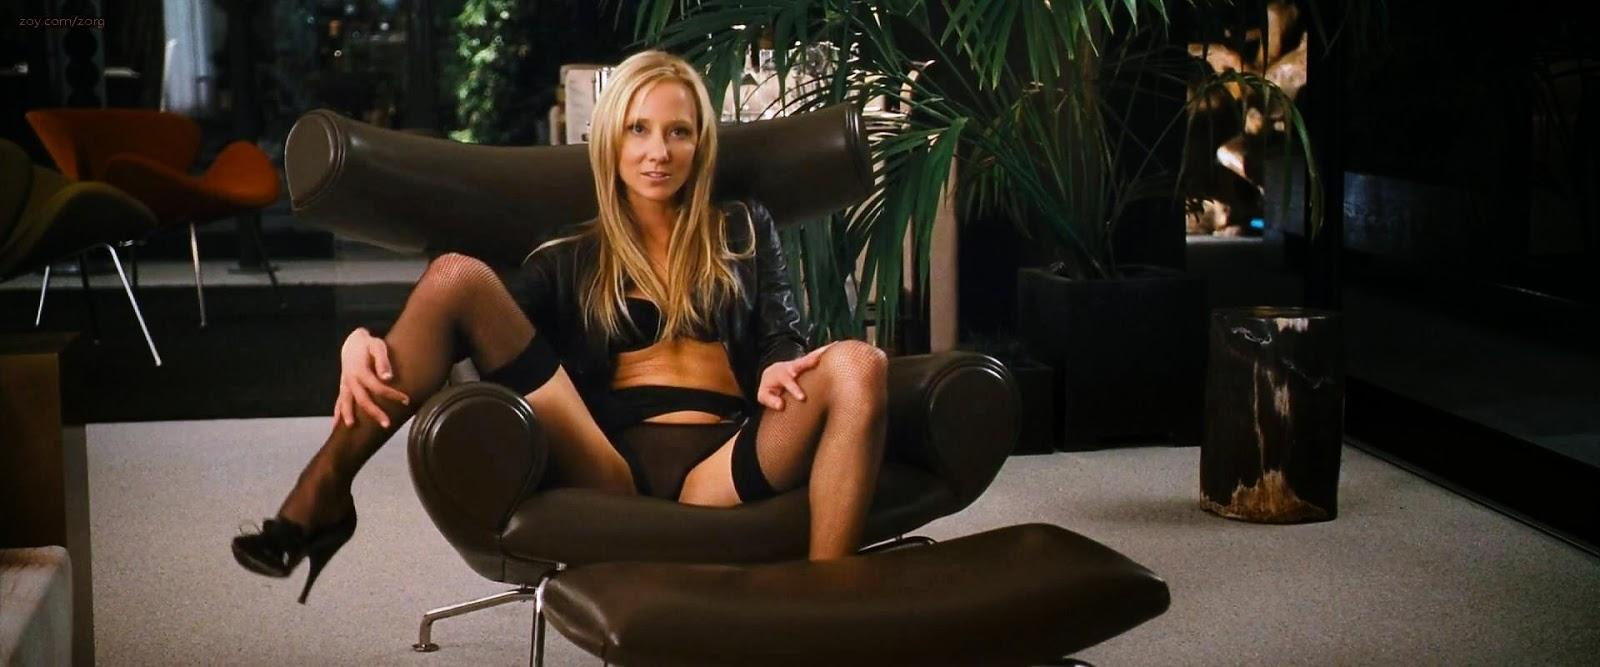 она бабник порно фильм кошанова